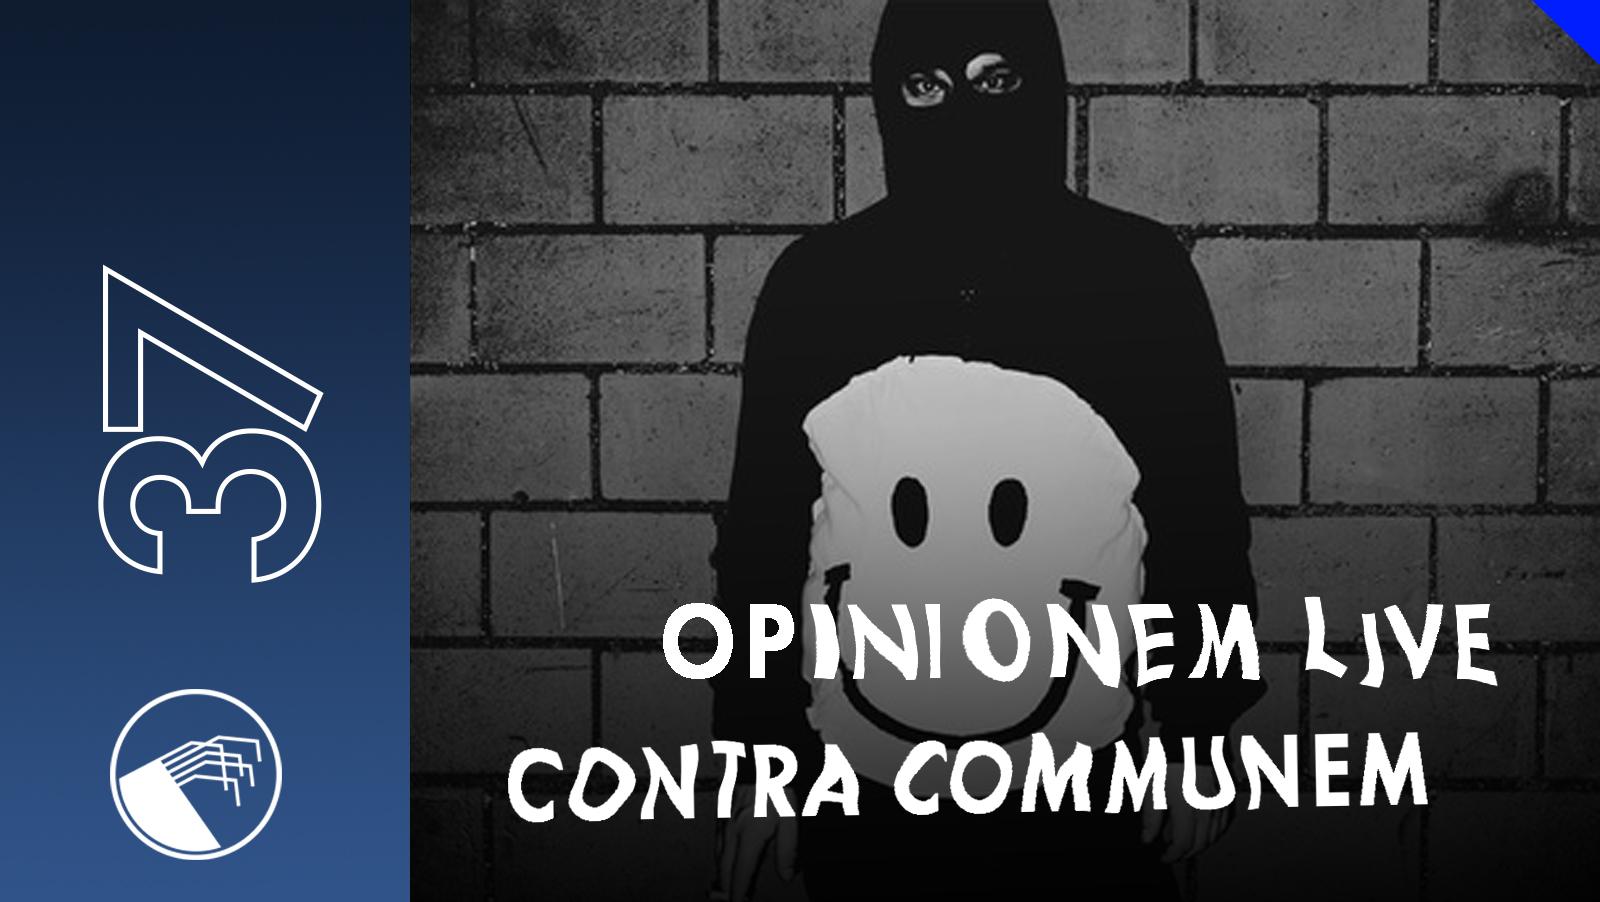 037 Contra Communem Opinionem LIVE